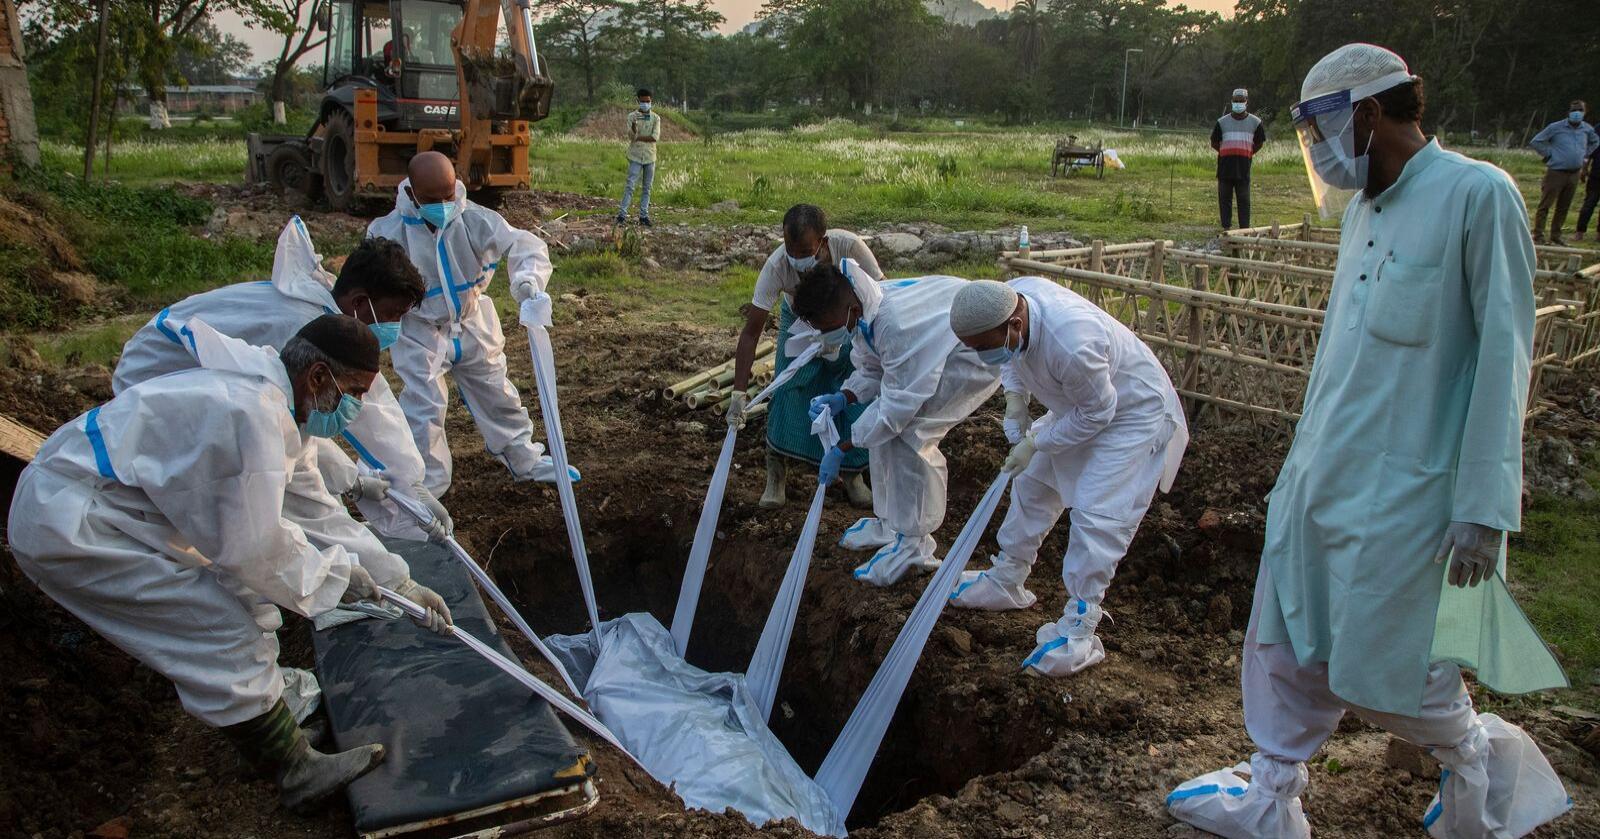 Flere fattige: FN beregner at pandemitiltakene kan resultere i 150 millioner flere ekstremt fattige og 130 millioner flere underernærte. Her blir et koronaoffer gravlagt i Gauhati i India. Foto: Anupam Nath / AP / NTB